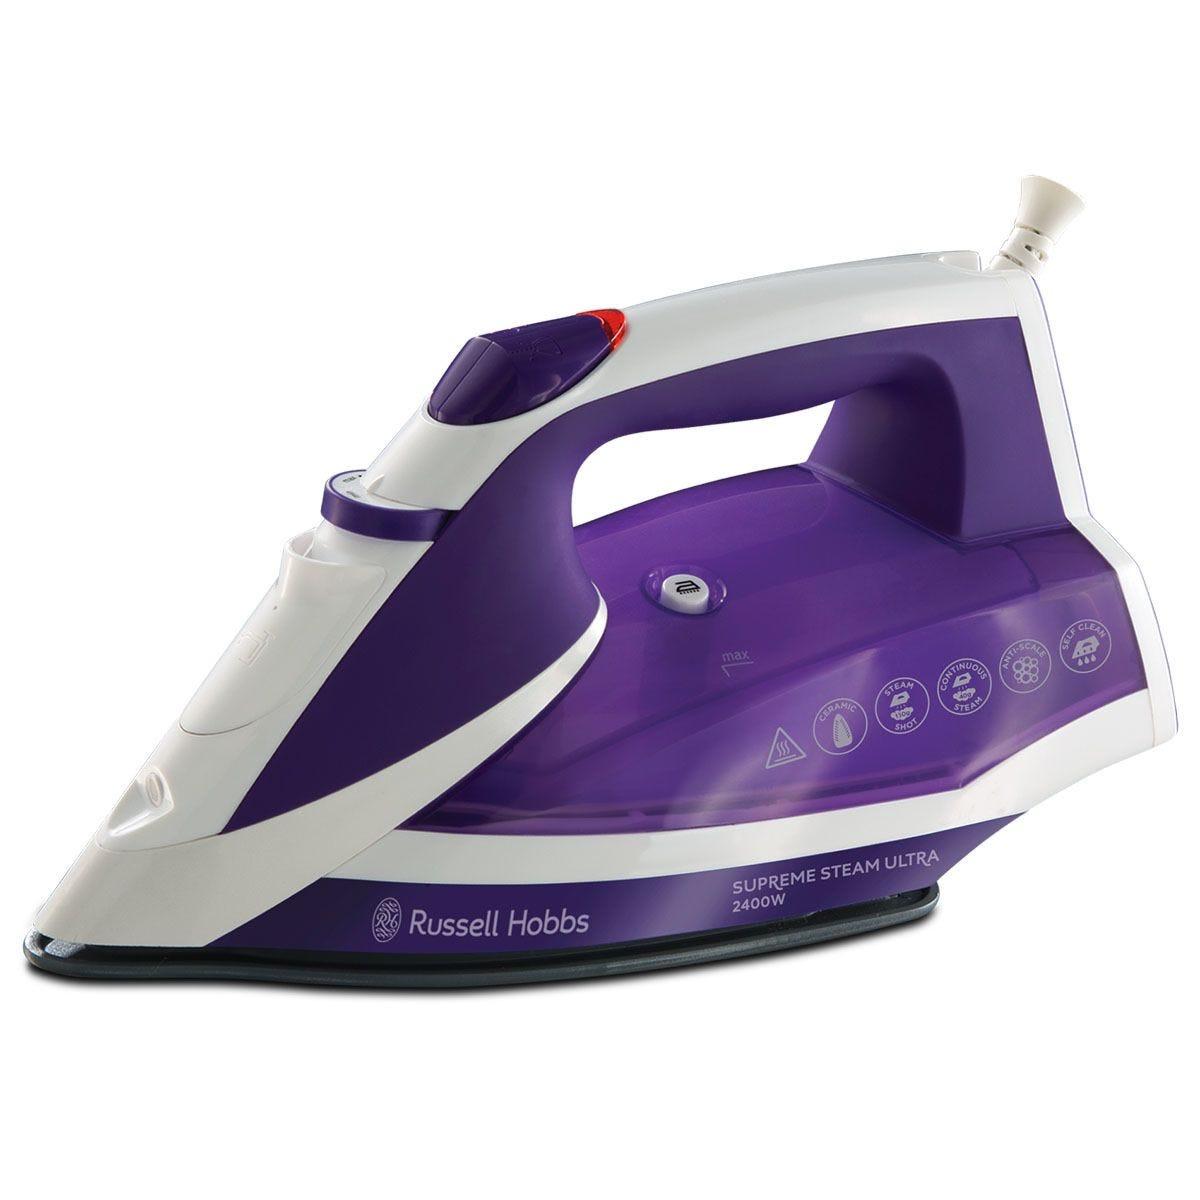 Russell Hobbs 23051 Supreme Steam Ultra 2400W Iron - Purple/White